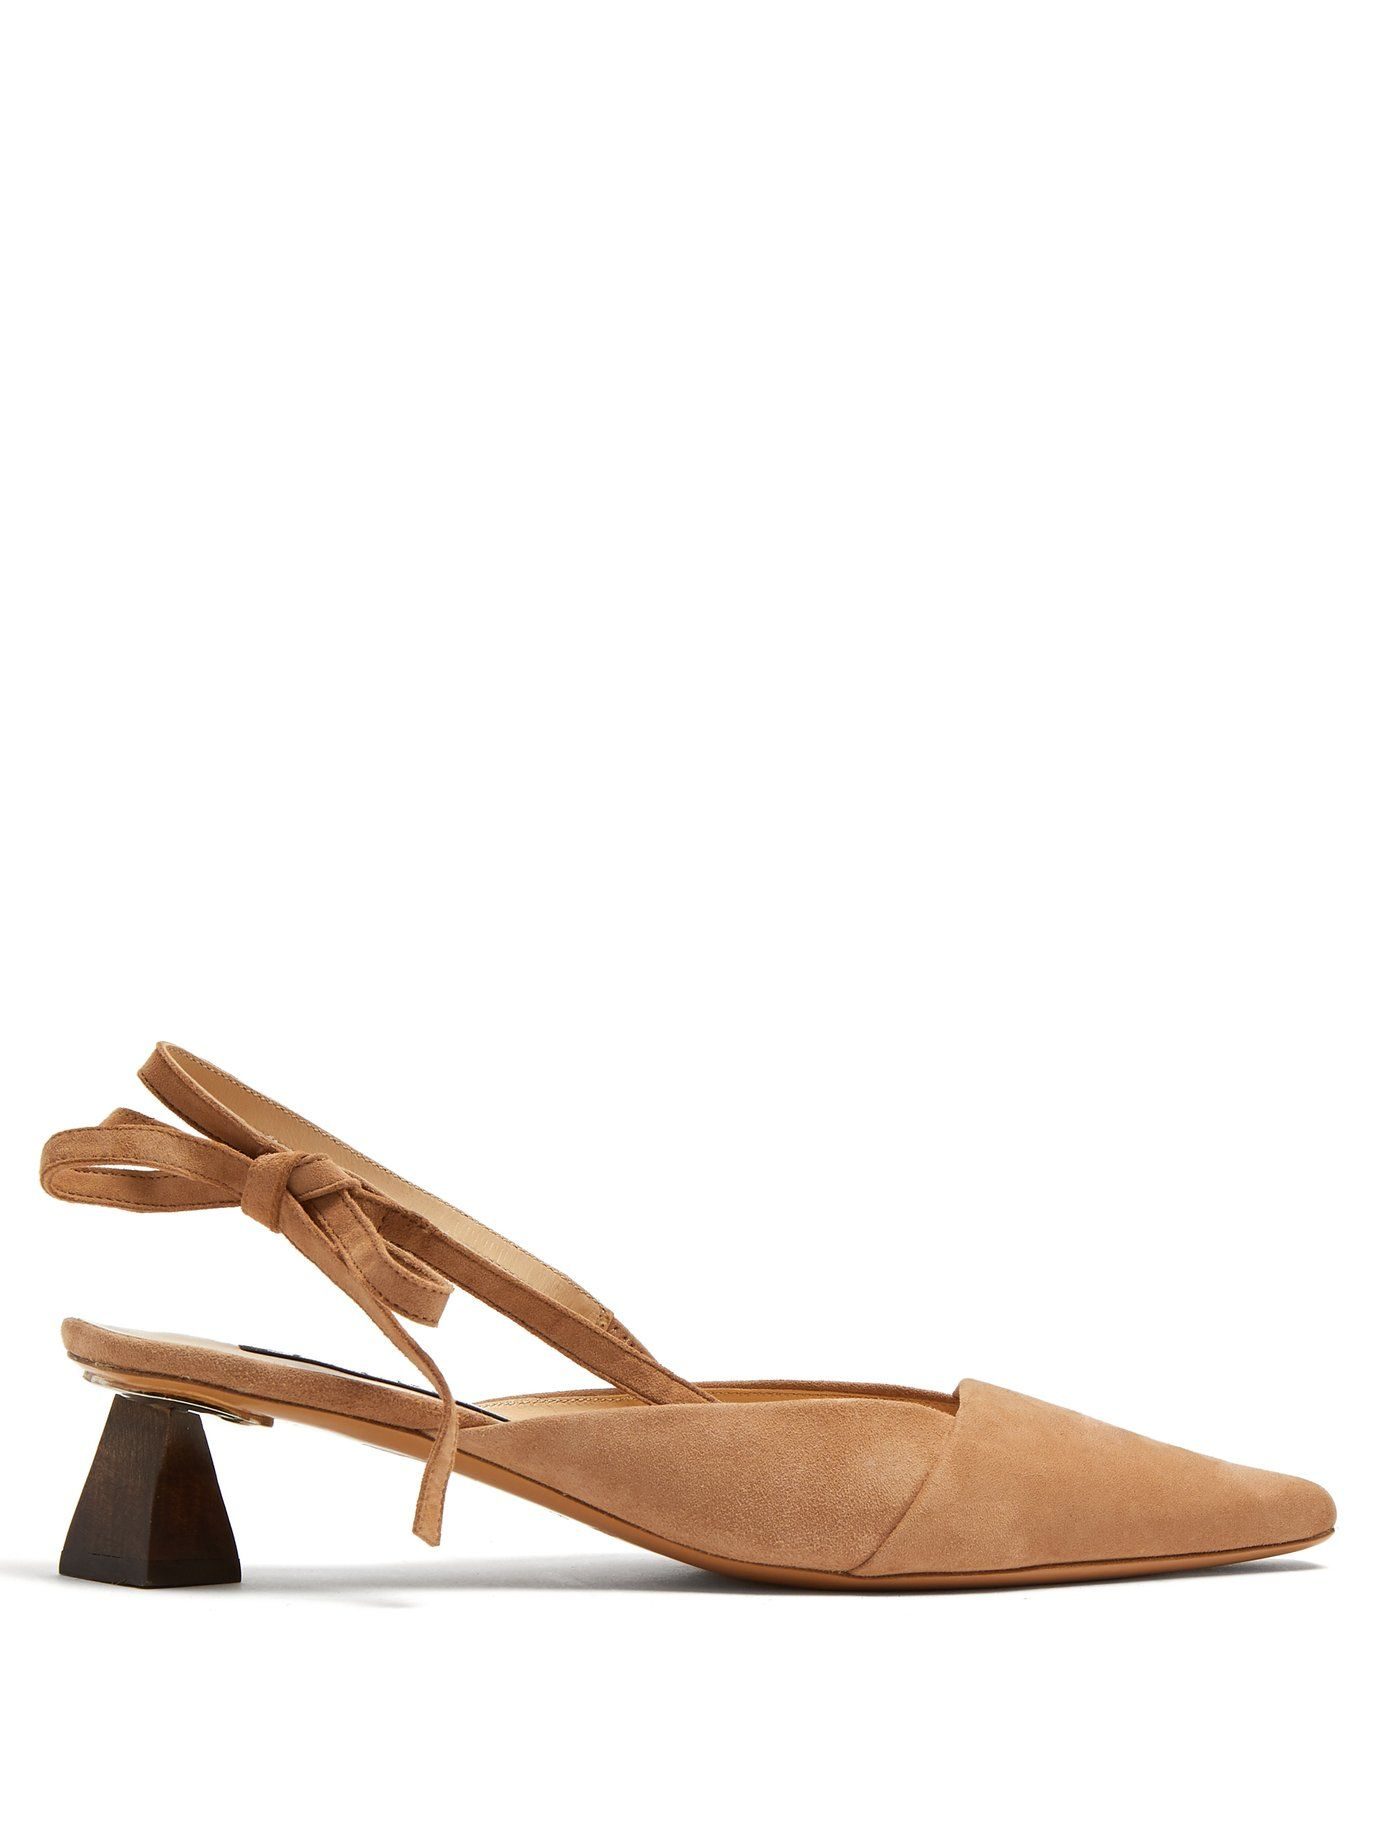 5ad689c6c3b Ornamental-heel suede slingback pumps